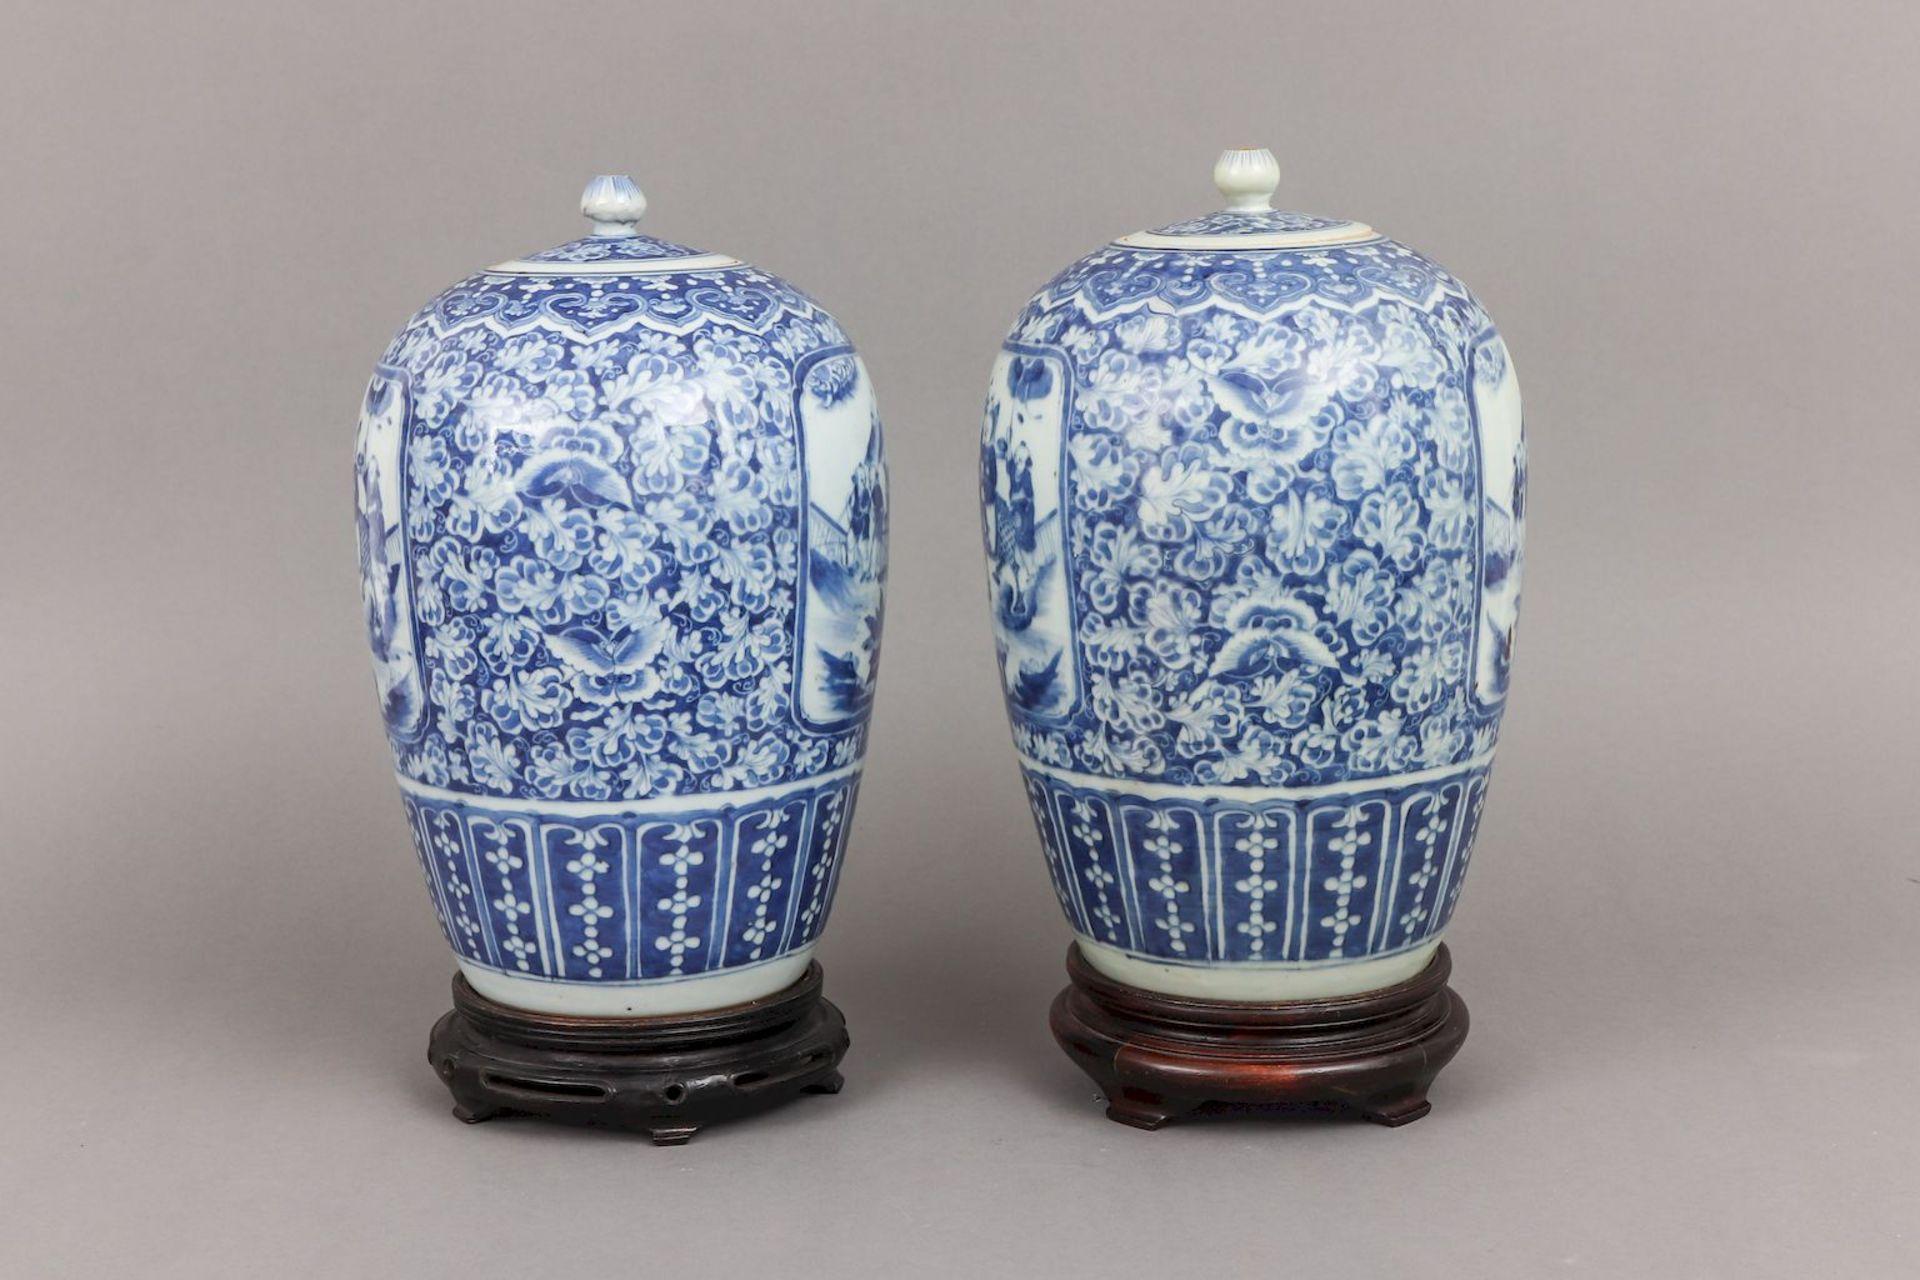 Paar chinesische Vorratsgefäße der Qing Dynastie (1644-1912) - Image 2 of 4